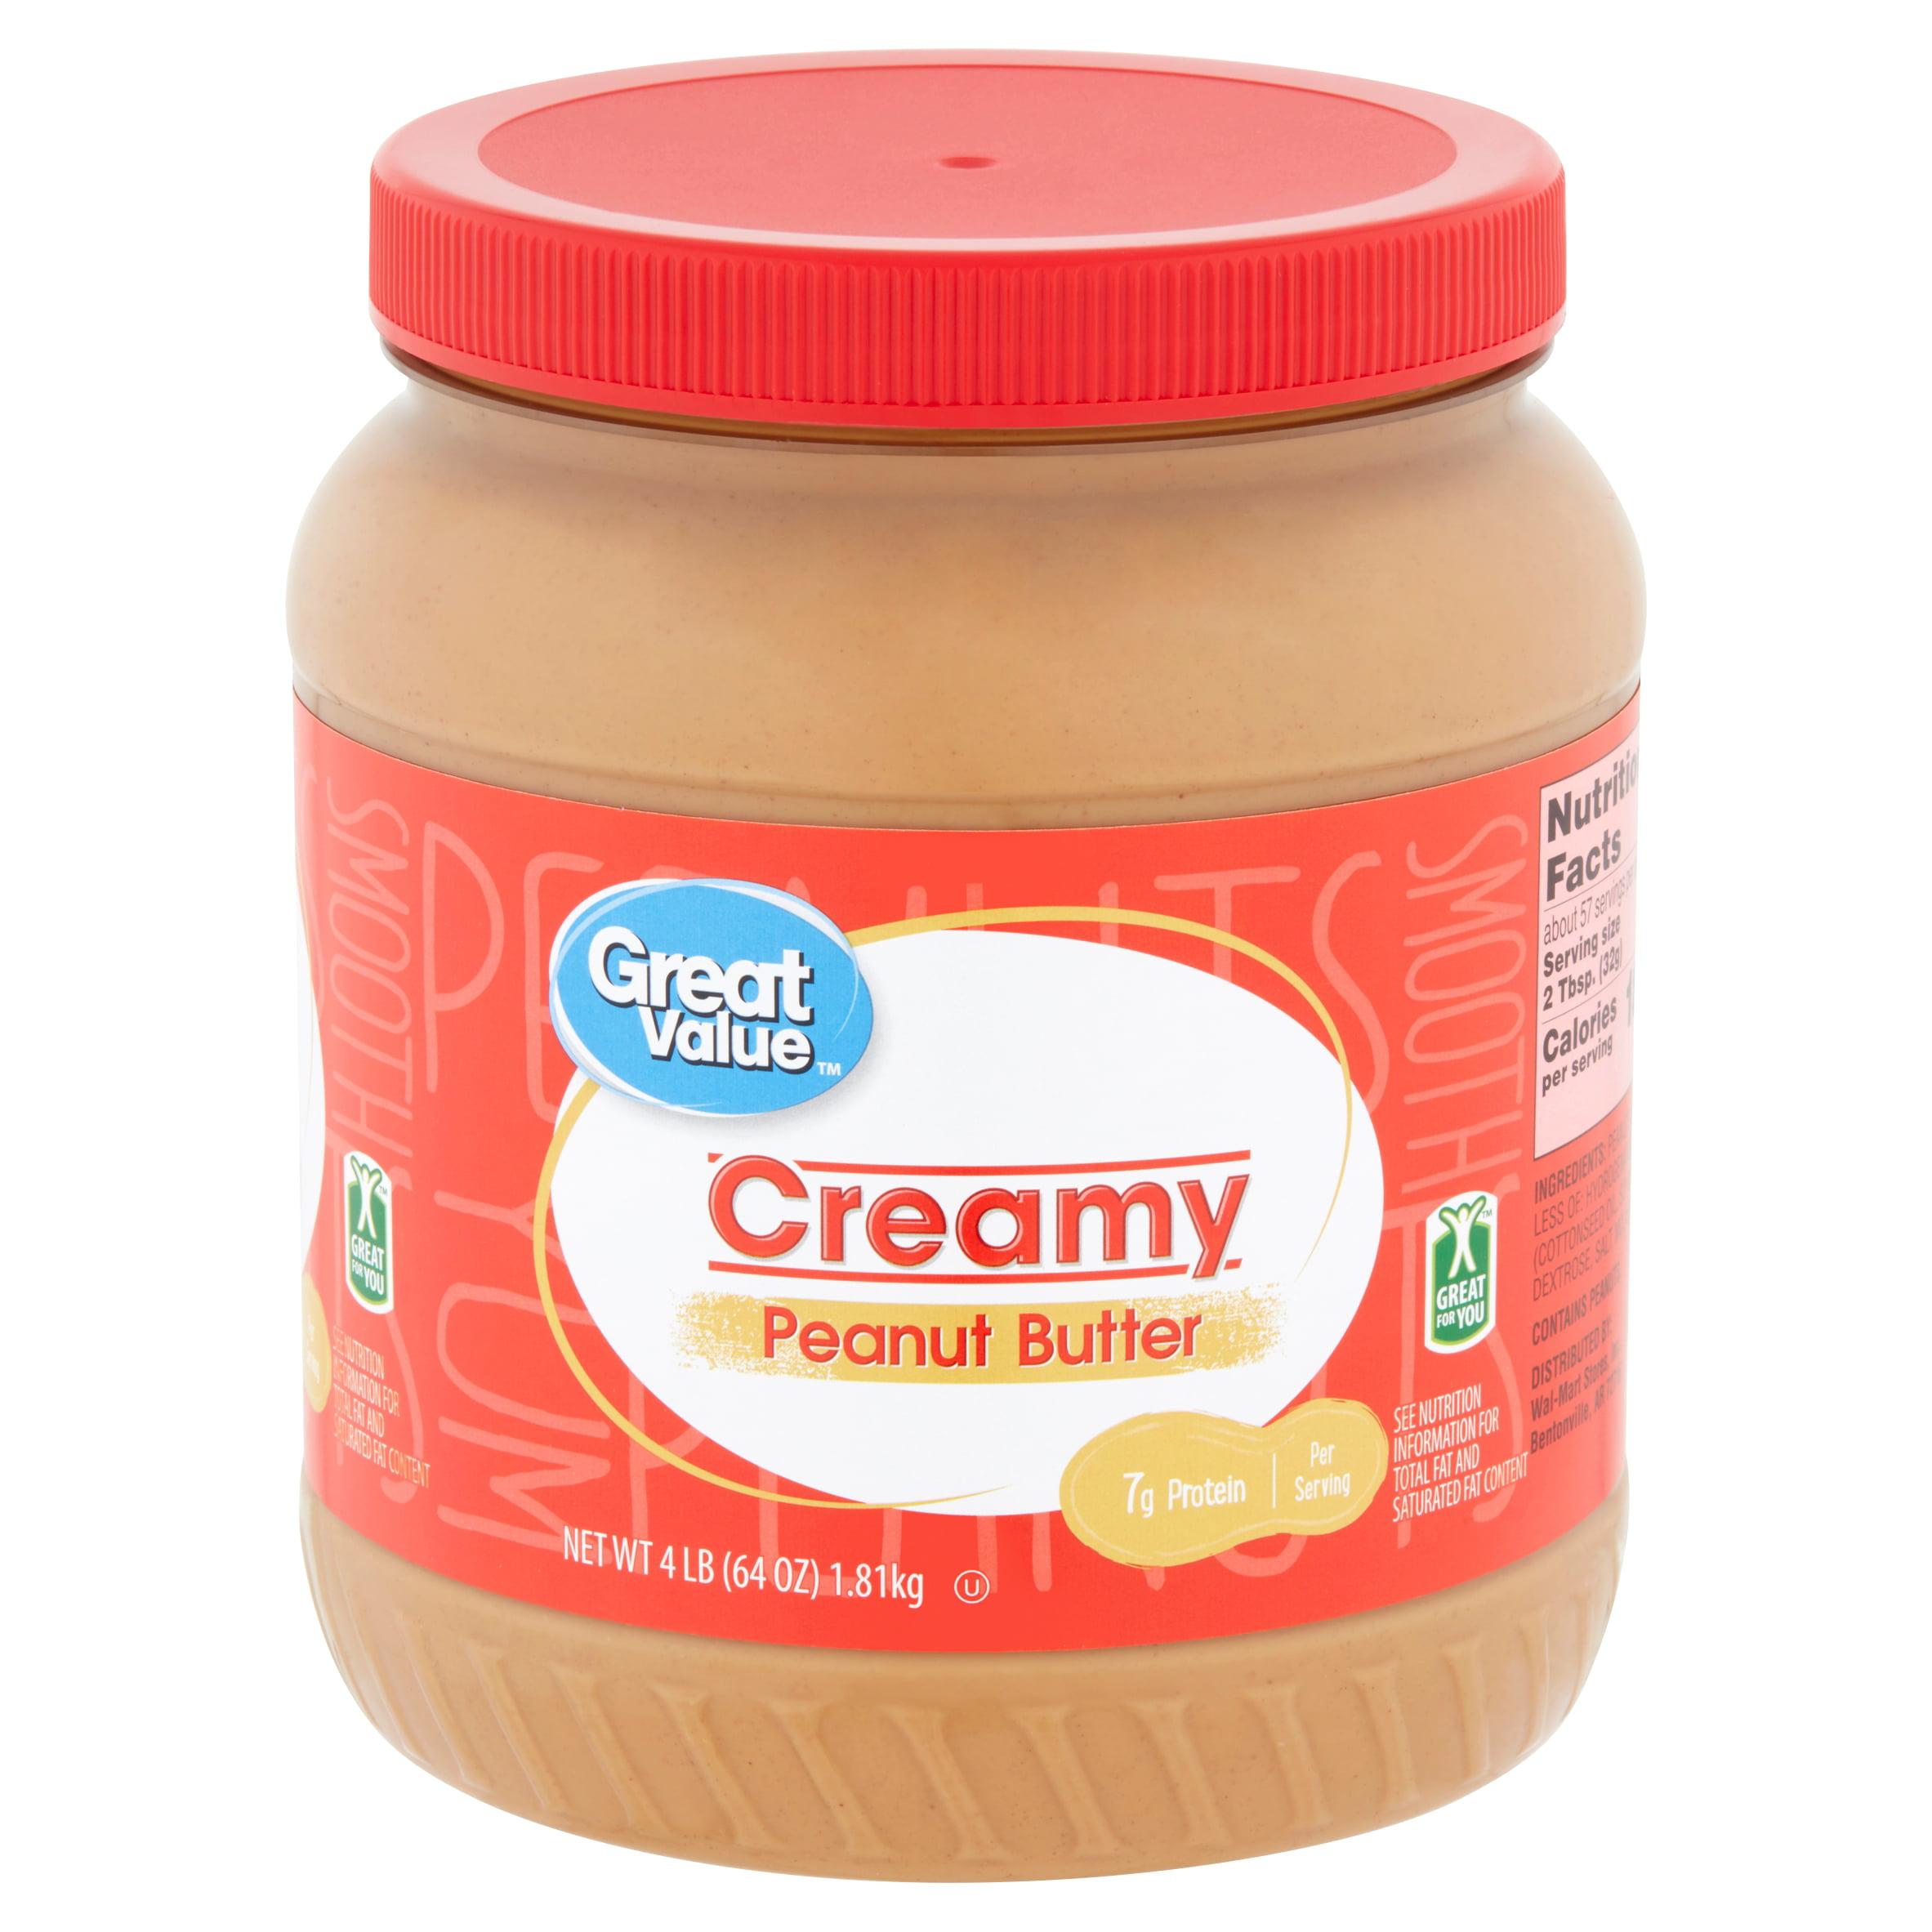 Great Value Creamy Peanut Butter, 4 lb